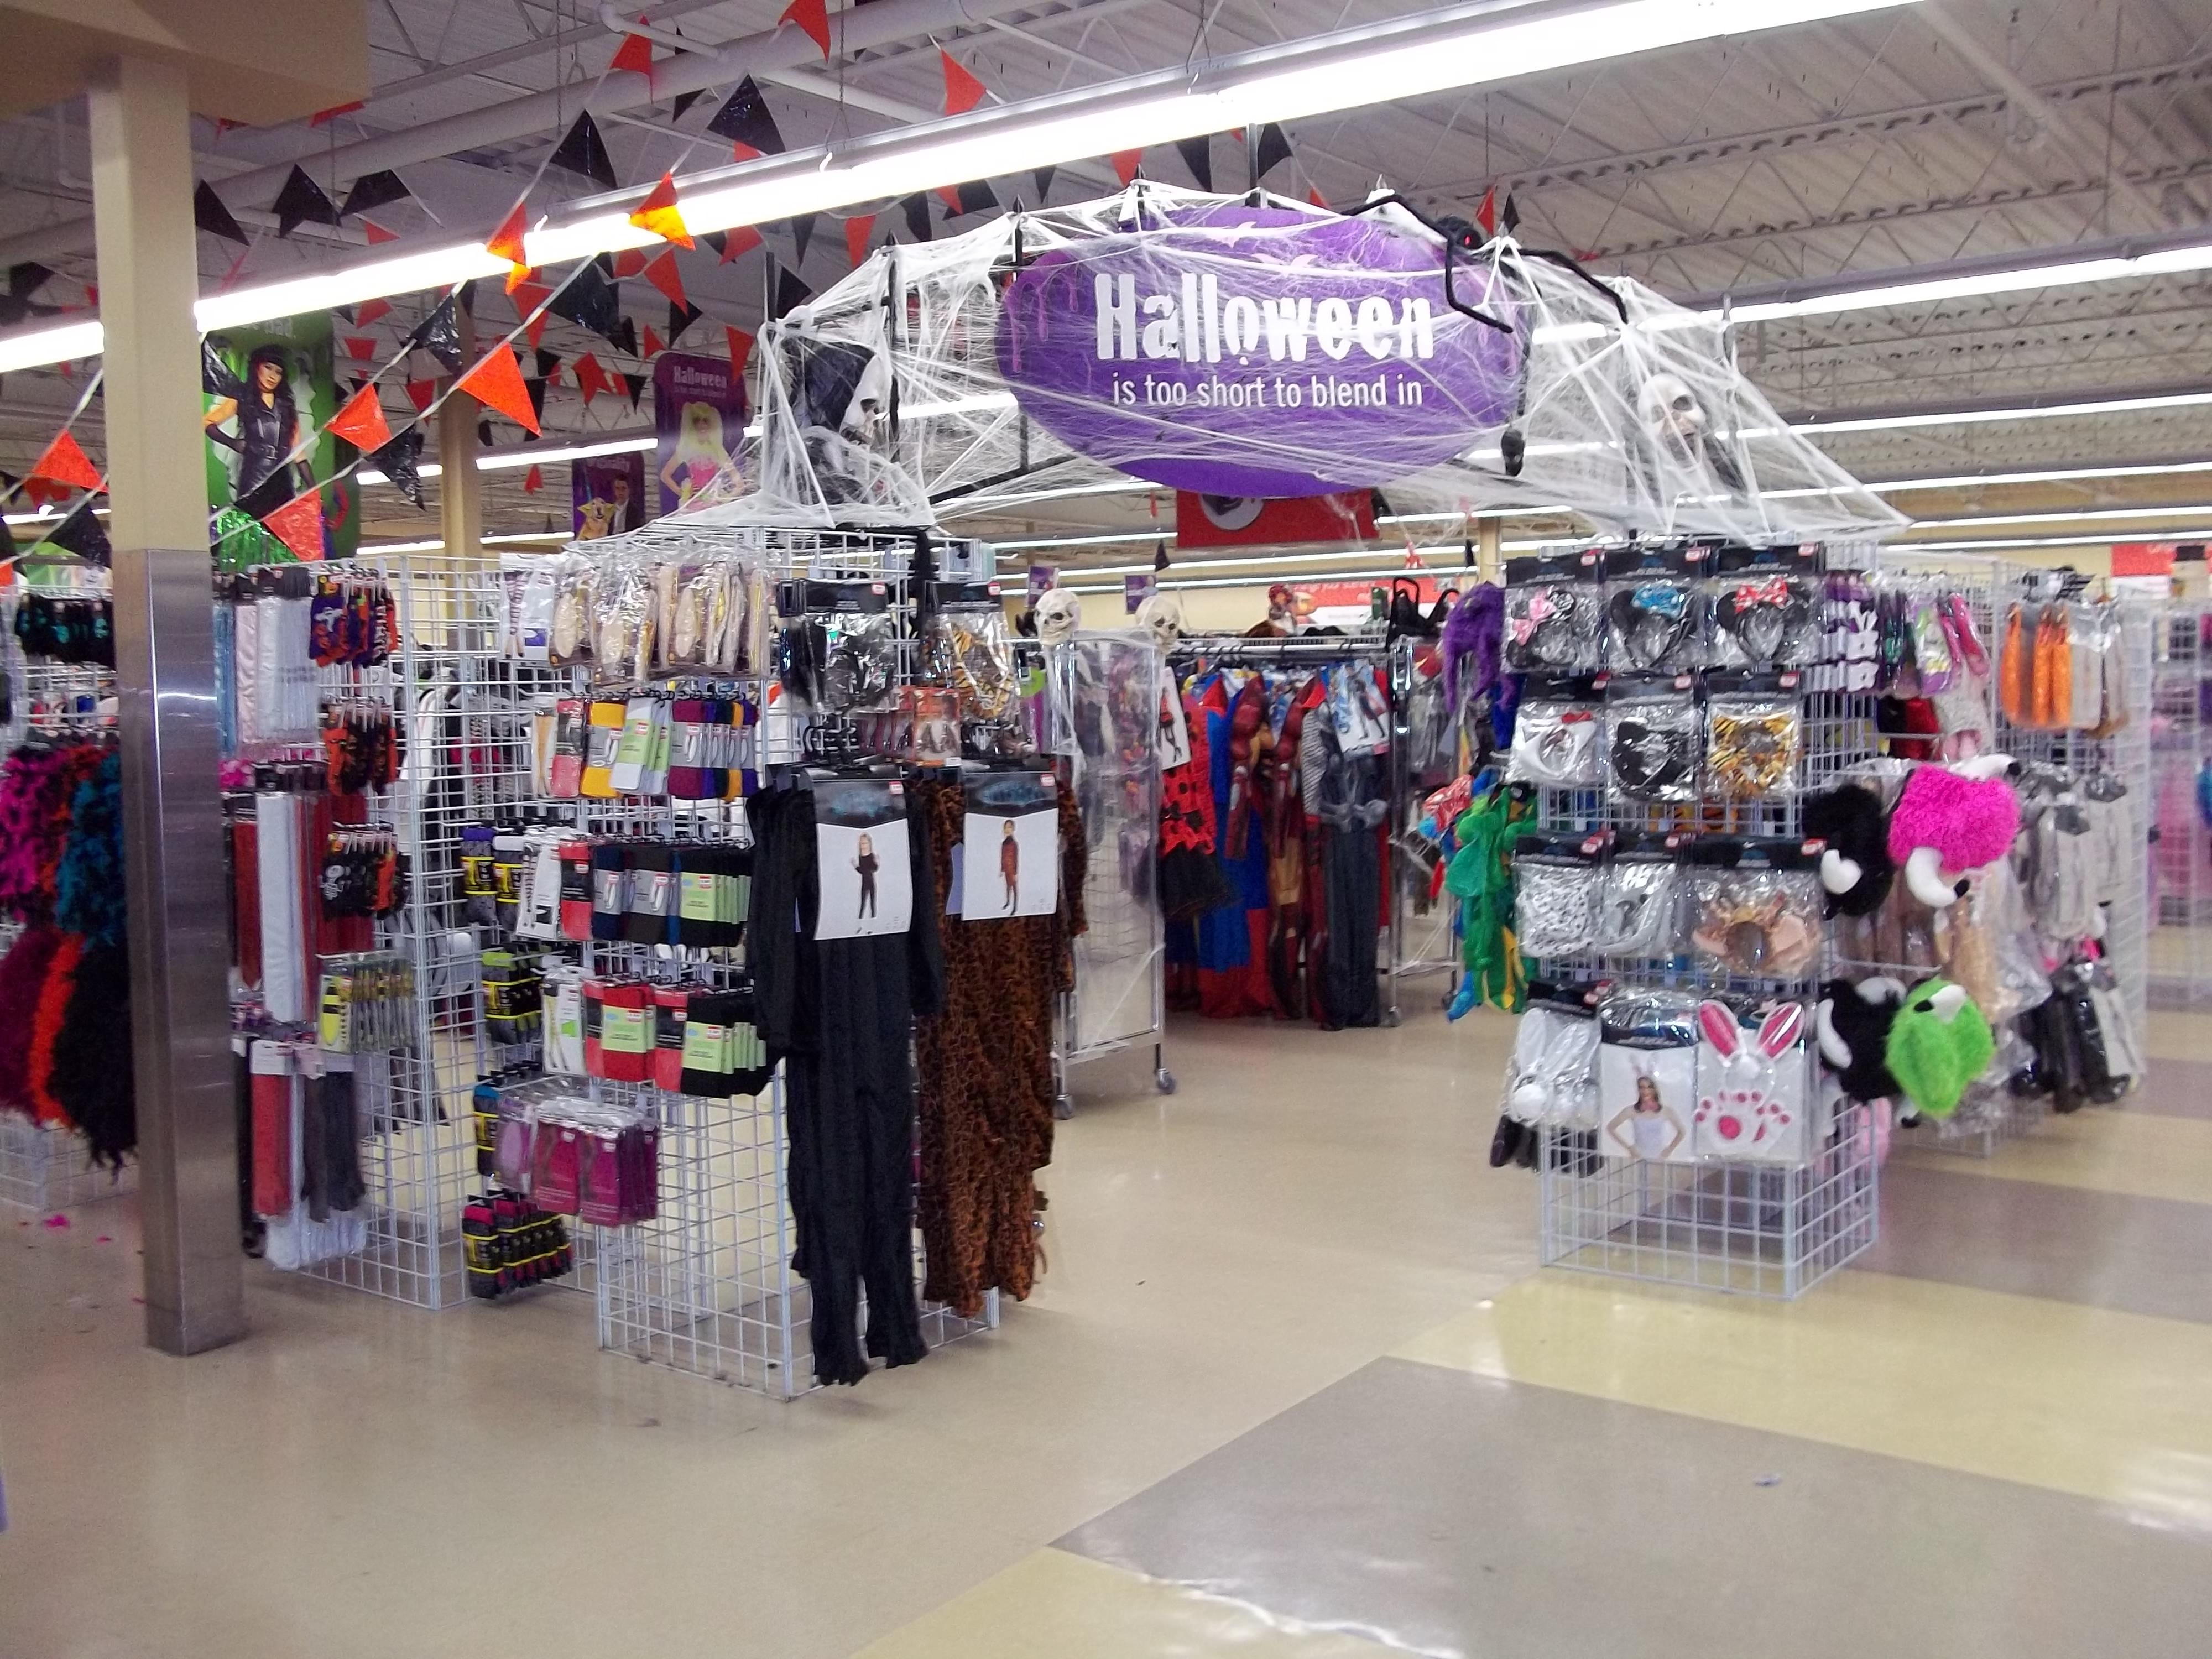 Halloween Costume Stores in Atlanta, GA for Kids Costumes  |Halloween Store